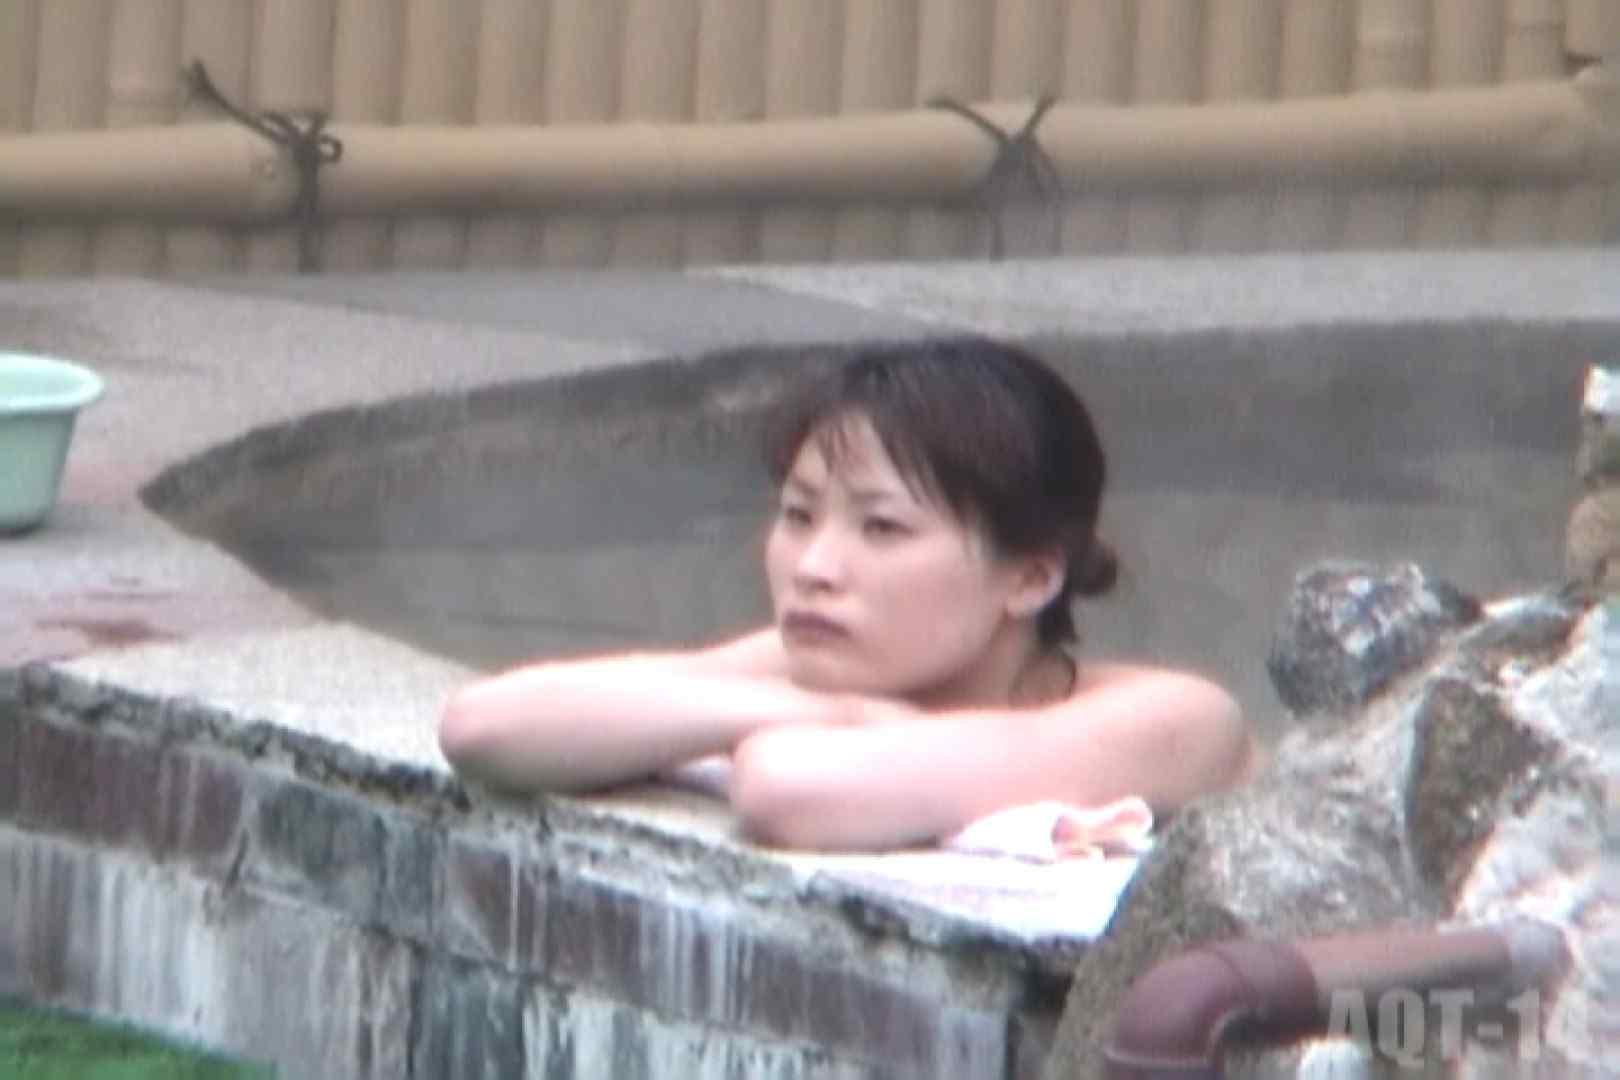 Aquaな露天風呂Vol.822 OLのエロ生活   露天風呂  62連発 4